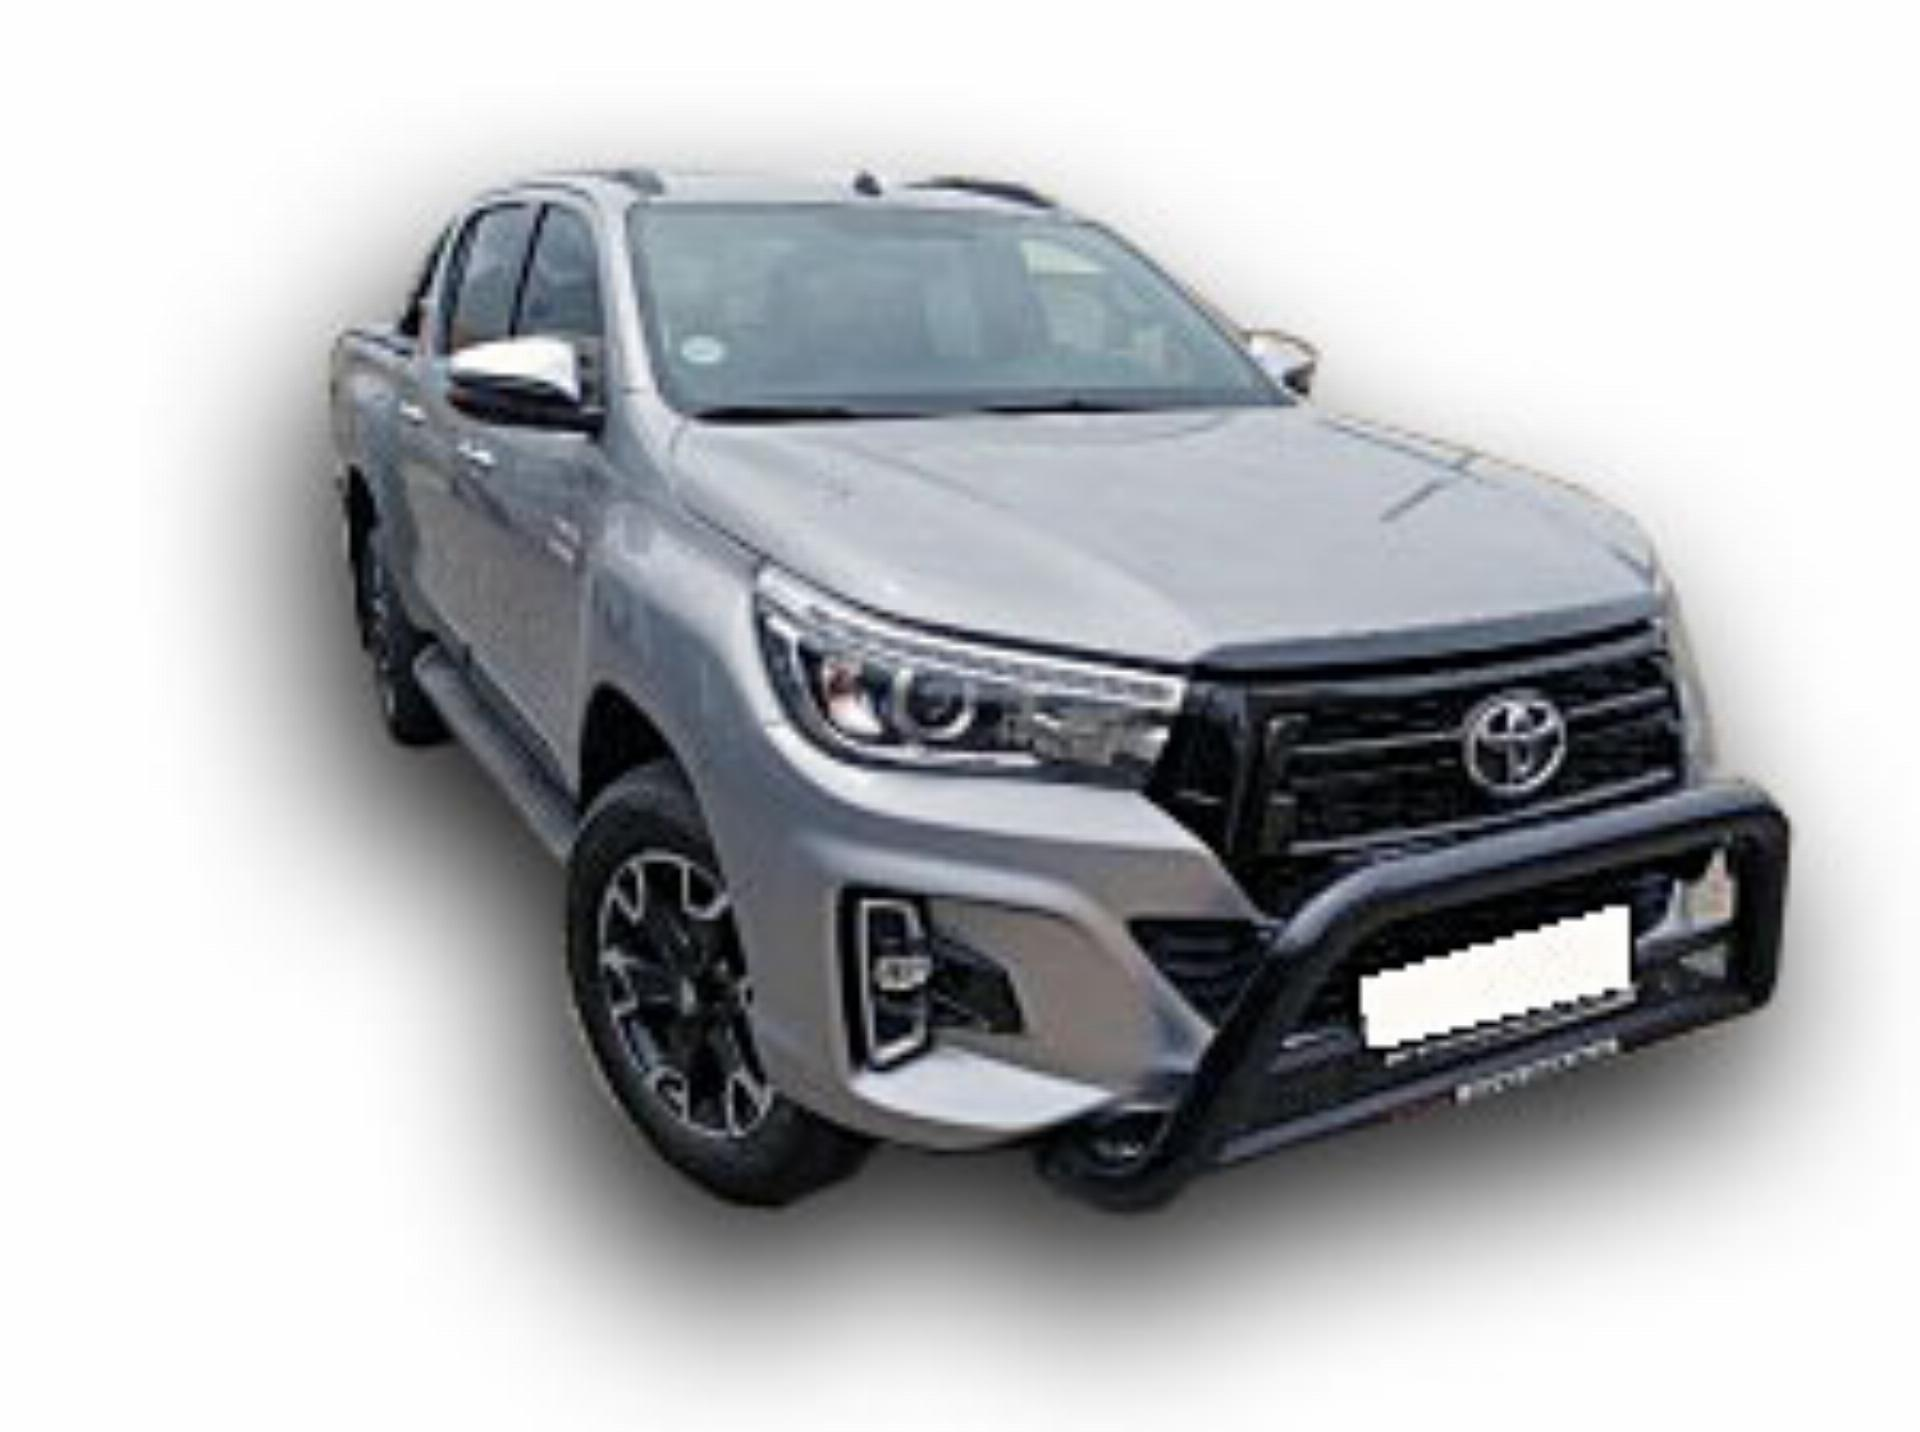 Toyota Hilux 2.8 GD-6 RB Raider